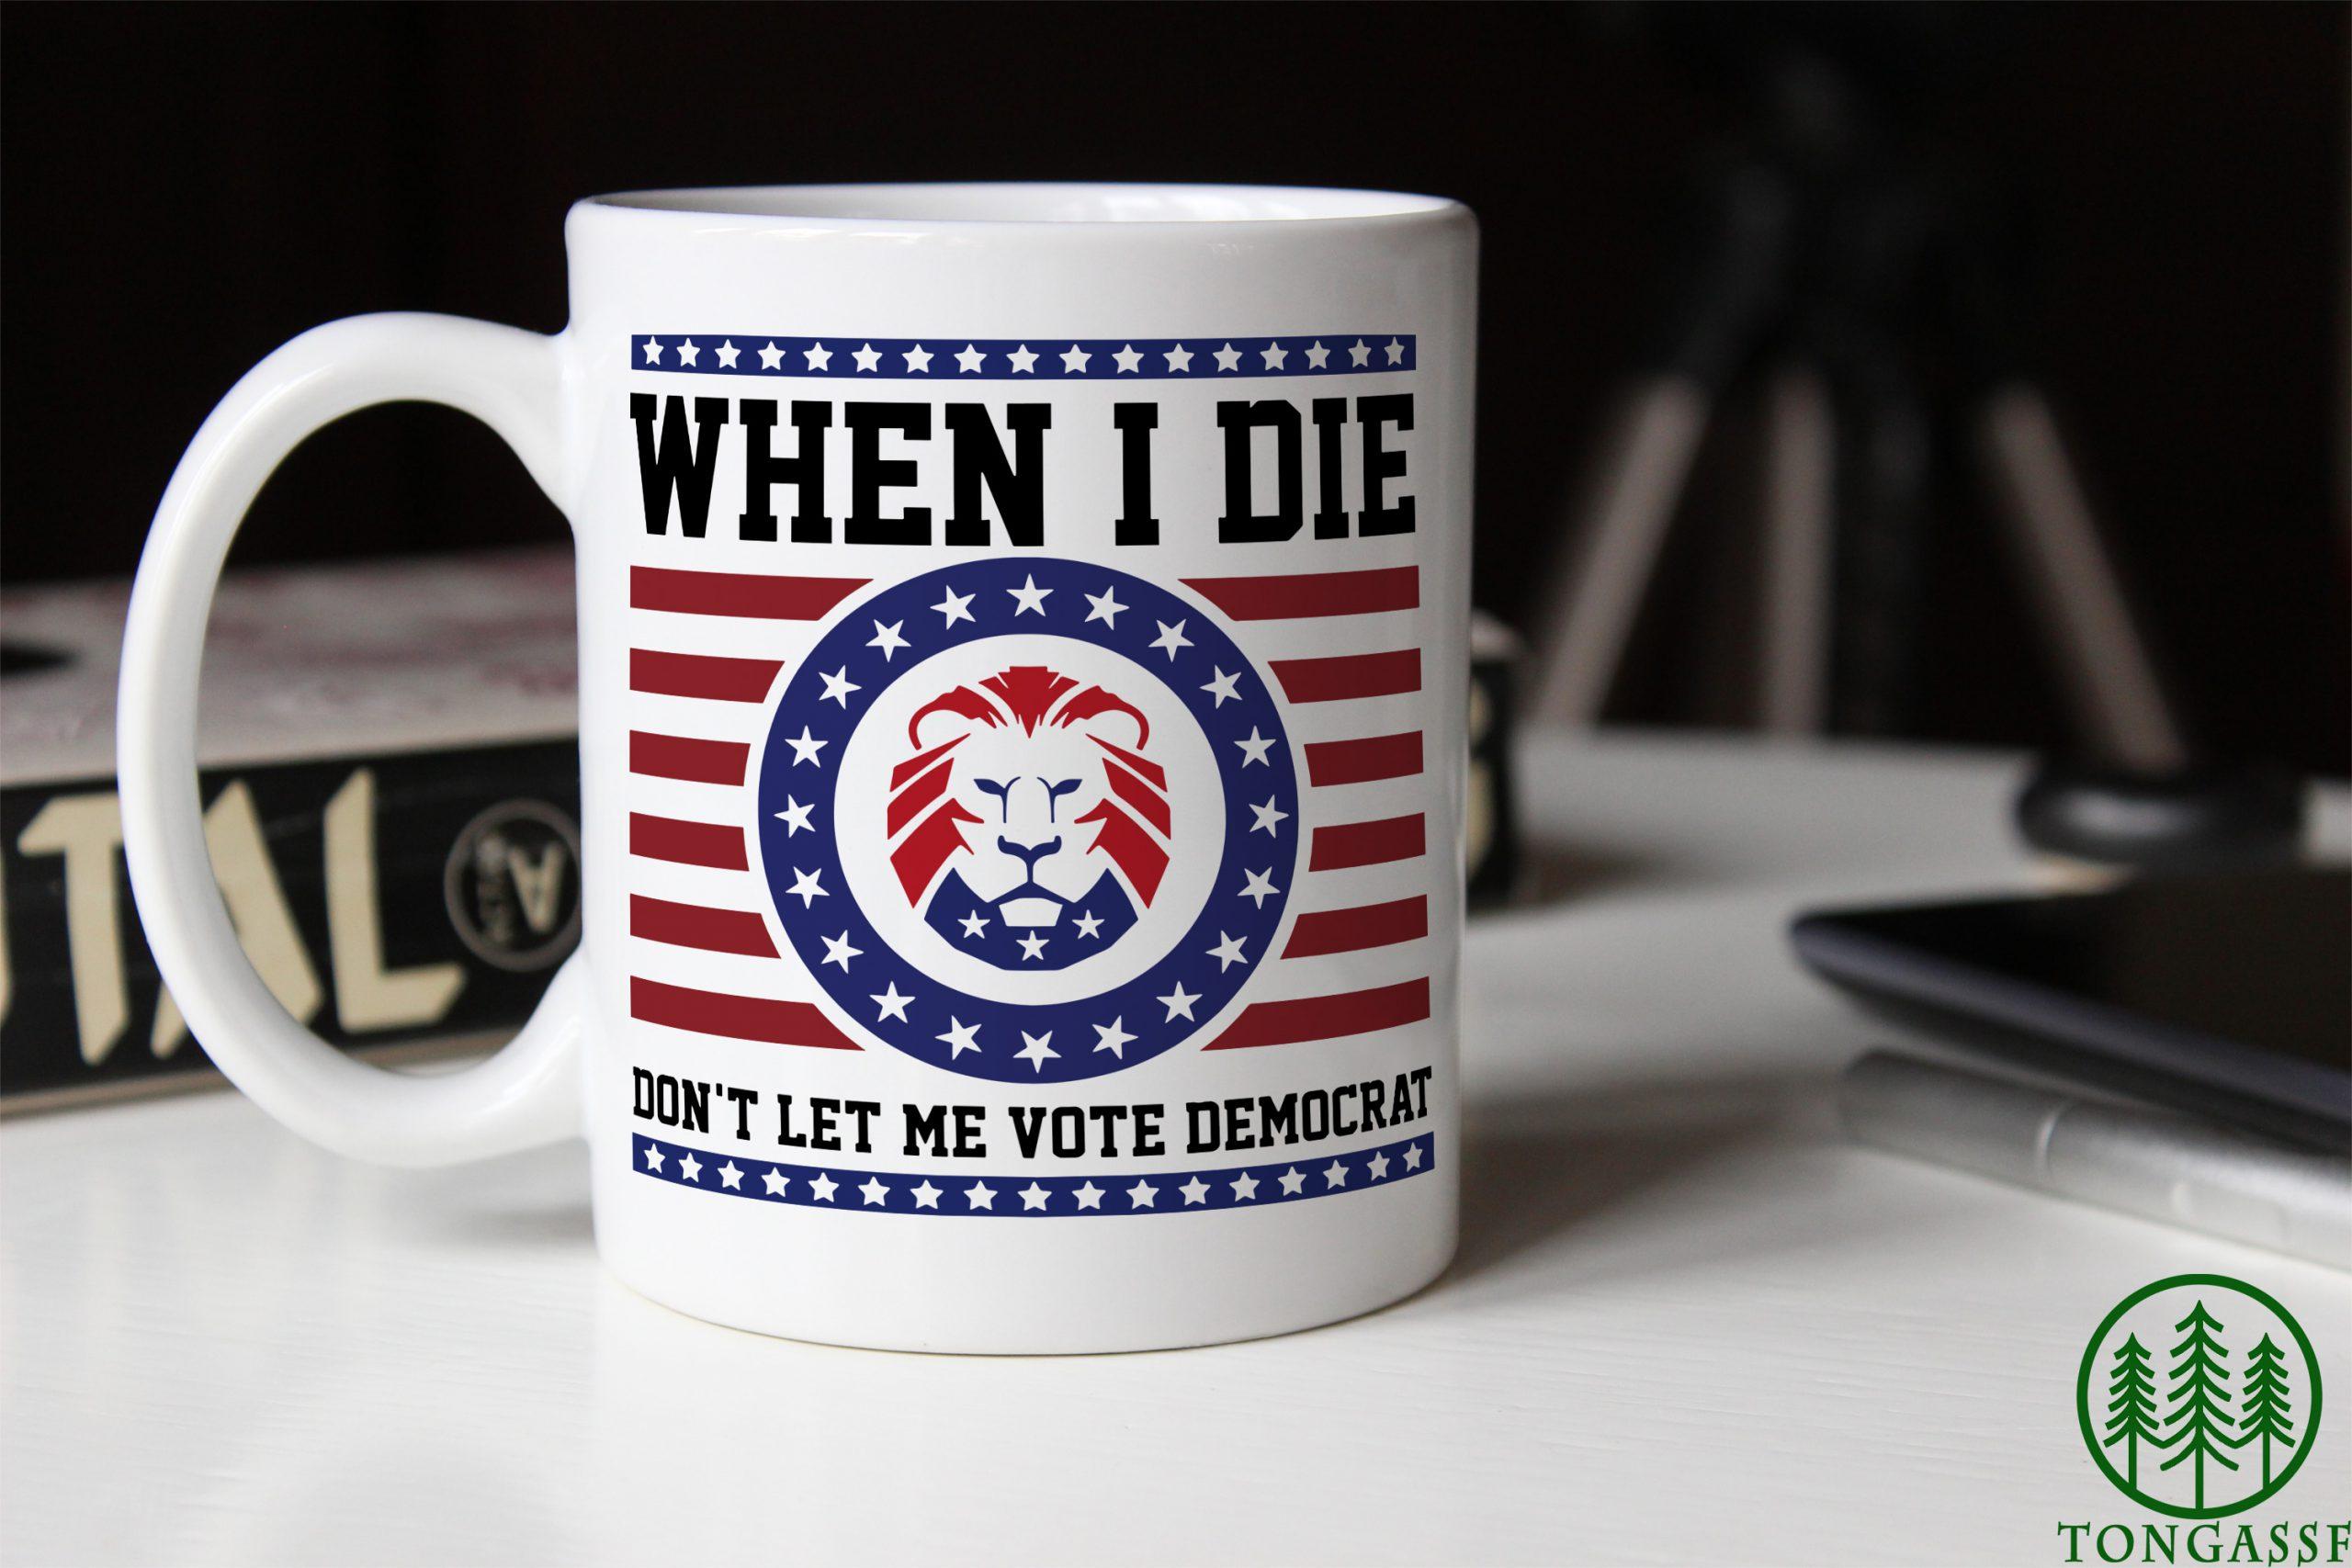 When I Die Dont Let Me Vote Democrat White Ceramic Mug